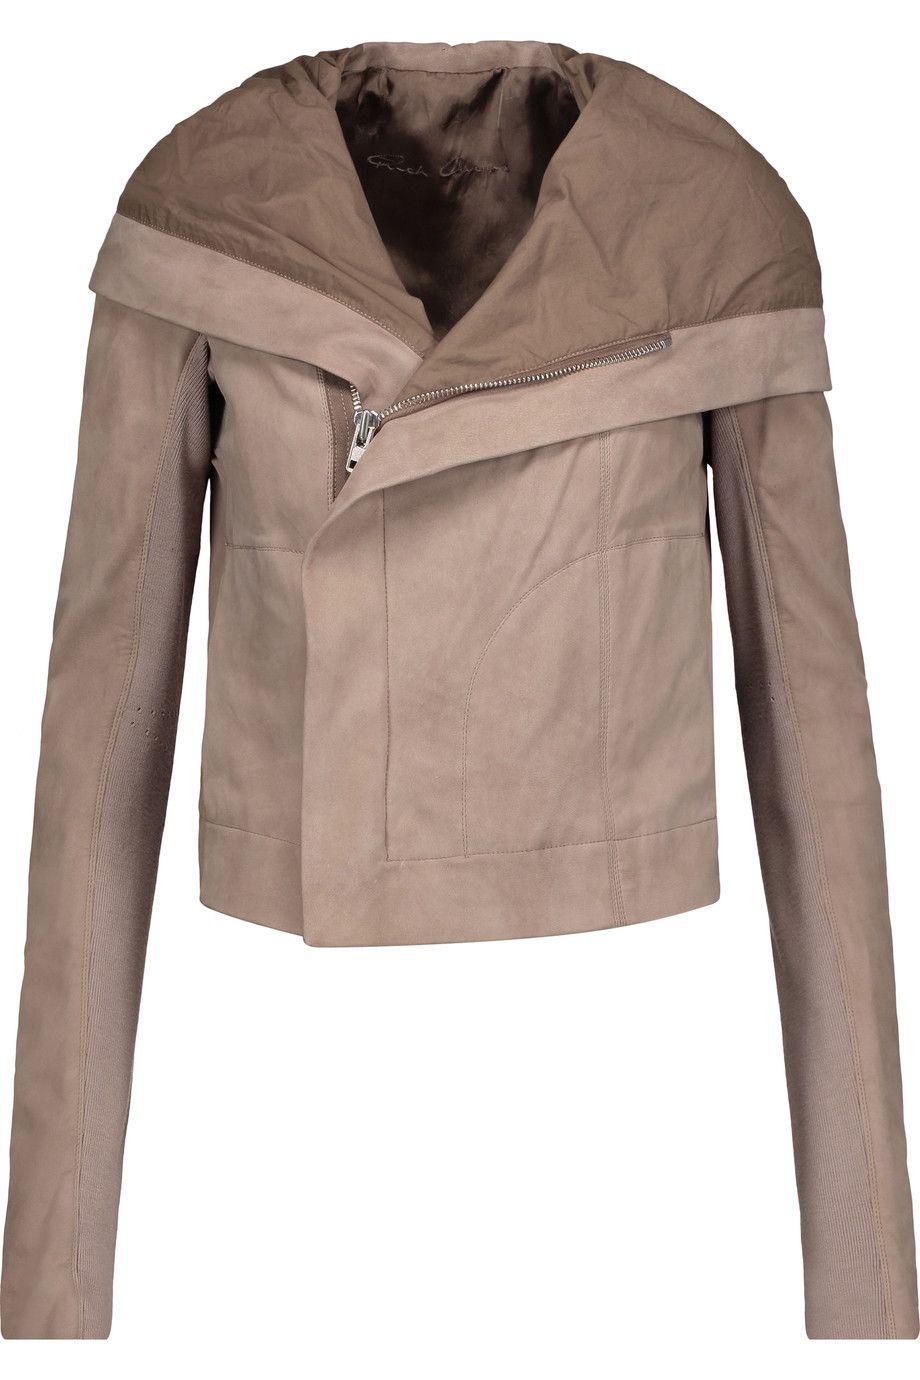 RICK OWENS Leather Hooded Jacket. rickowens cloth